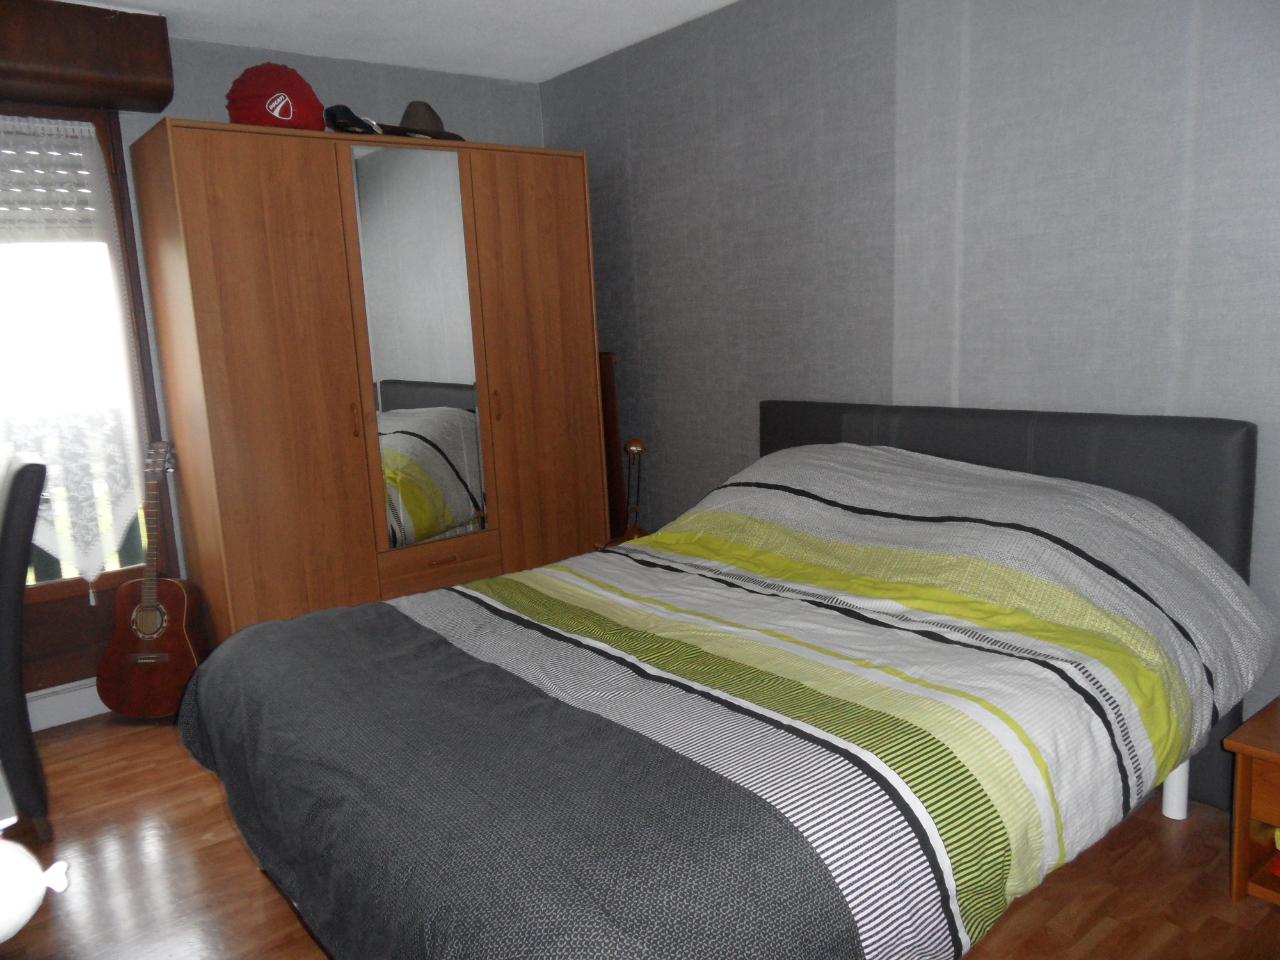 Vente appartement T3  à HENDAYE - 3